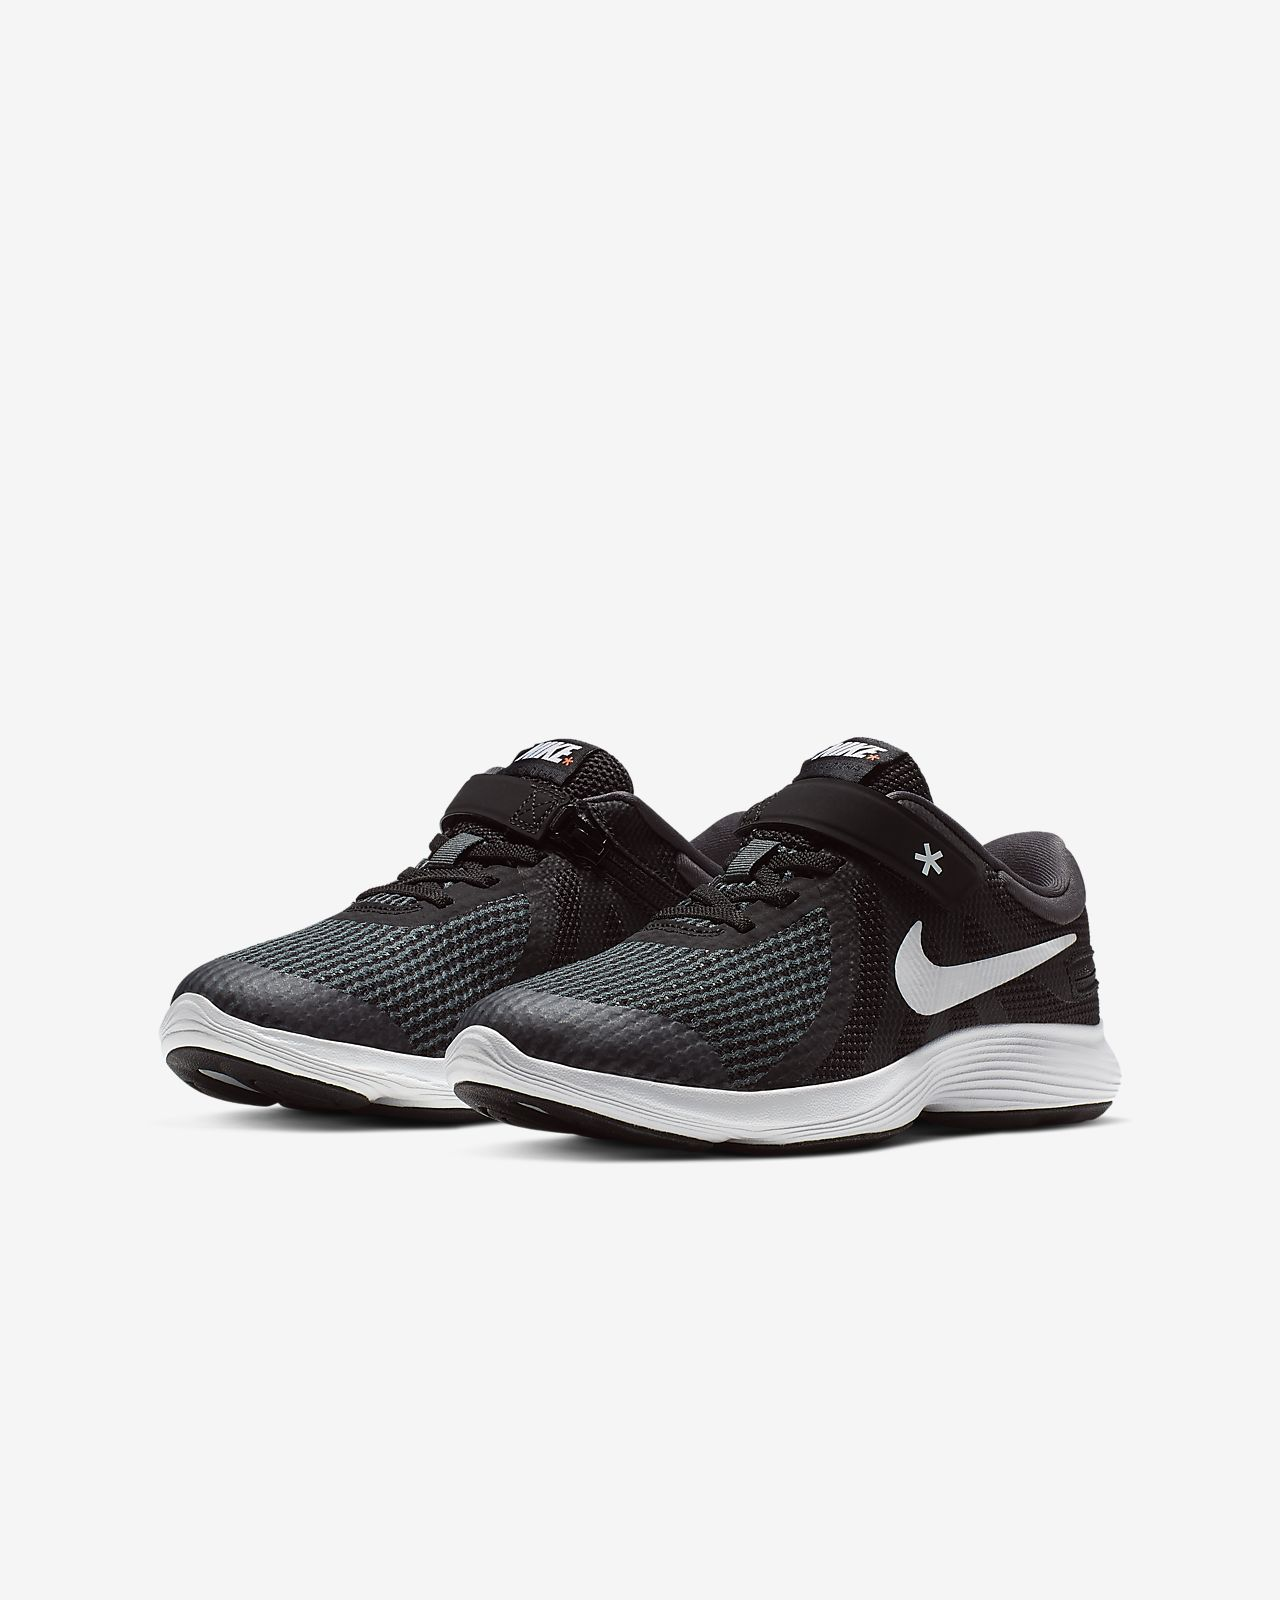 3b5e6c02faf Nike Revolution 4 Flyease 4E Big Kids  Running Shoe. Nike.com